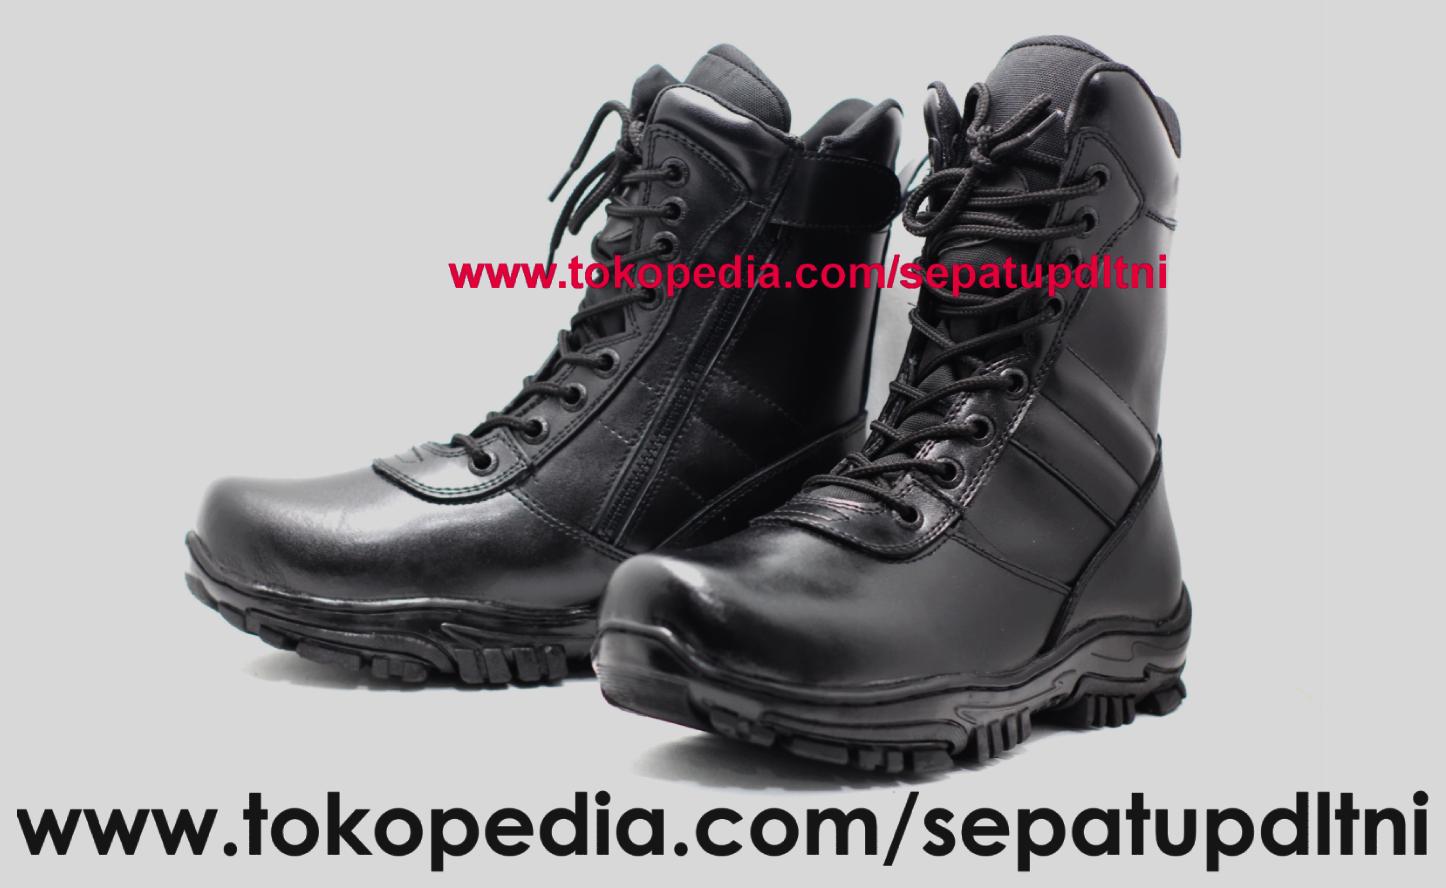 Jual Sepatu PDL Jatah TNI ASLI Kulit 100% - Sepatu PDL TNI ... d5314c03ae